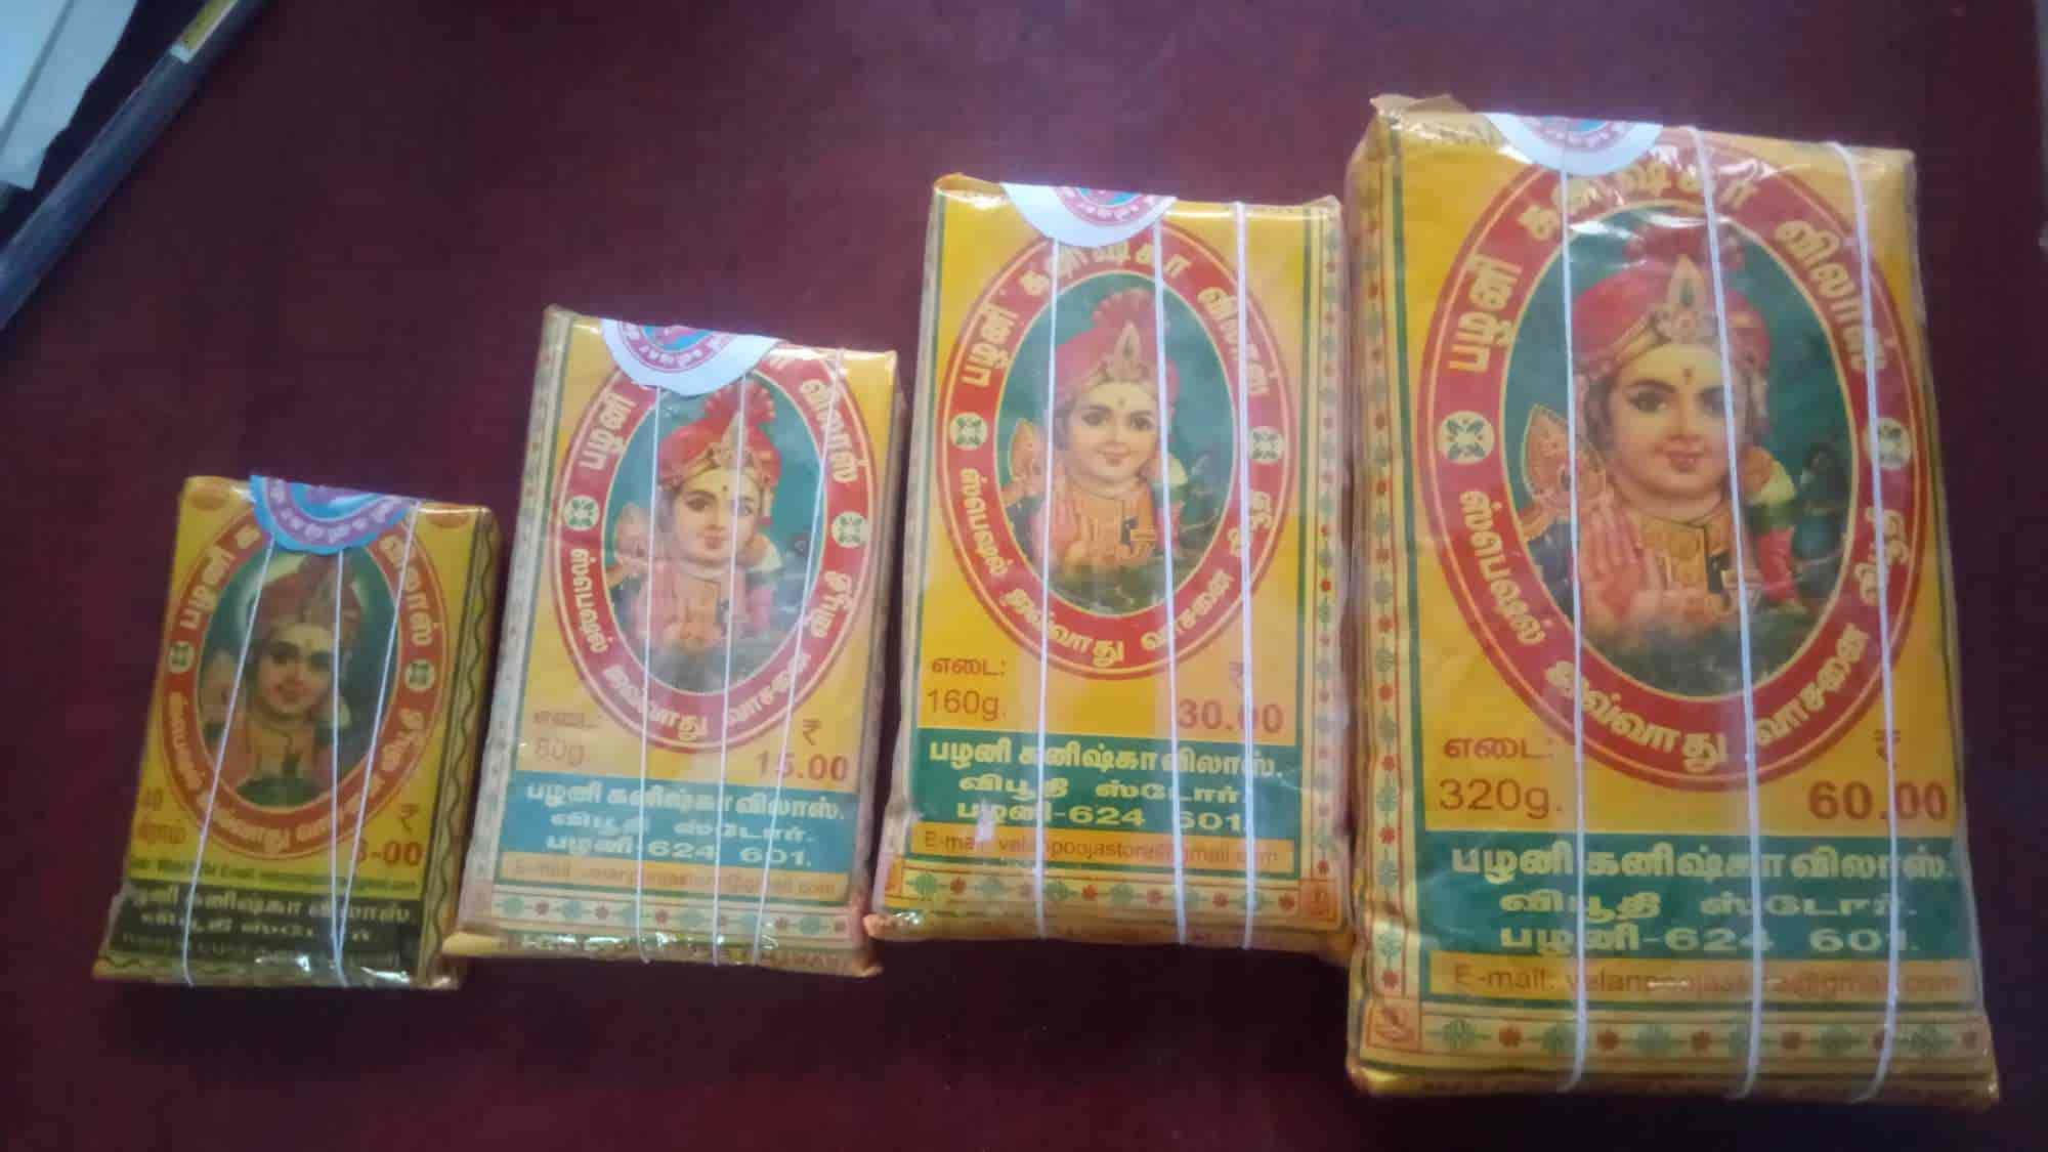 velan pooja store, opp tamilan offest - Puja Item Dealers in Palani